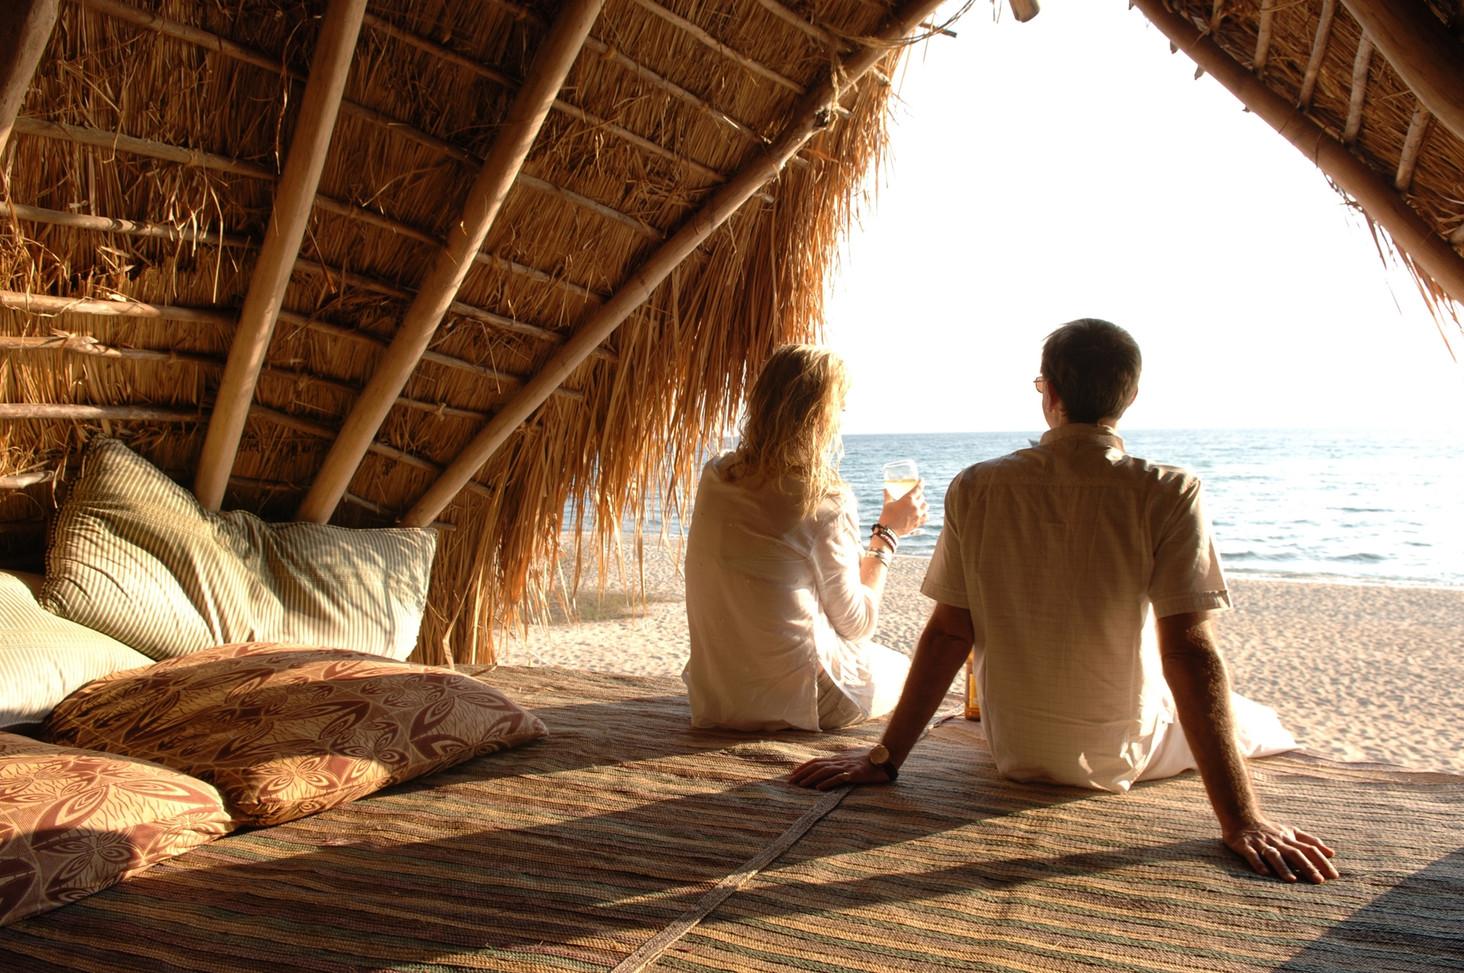 Ultimate Relaxation at Greystokes, Mahale, Tanzania